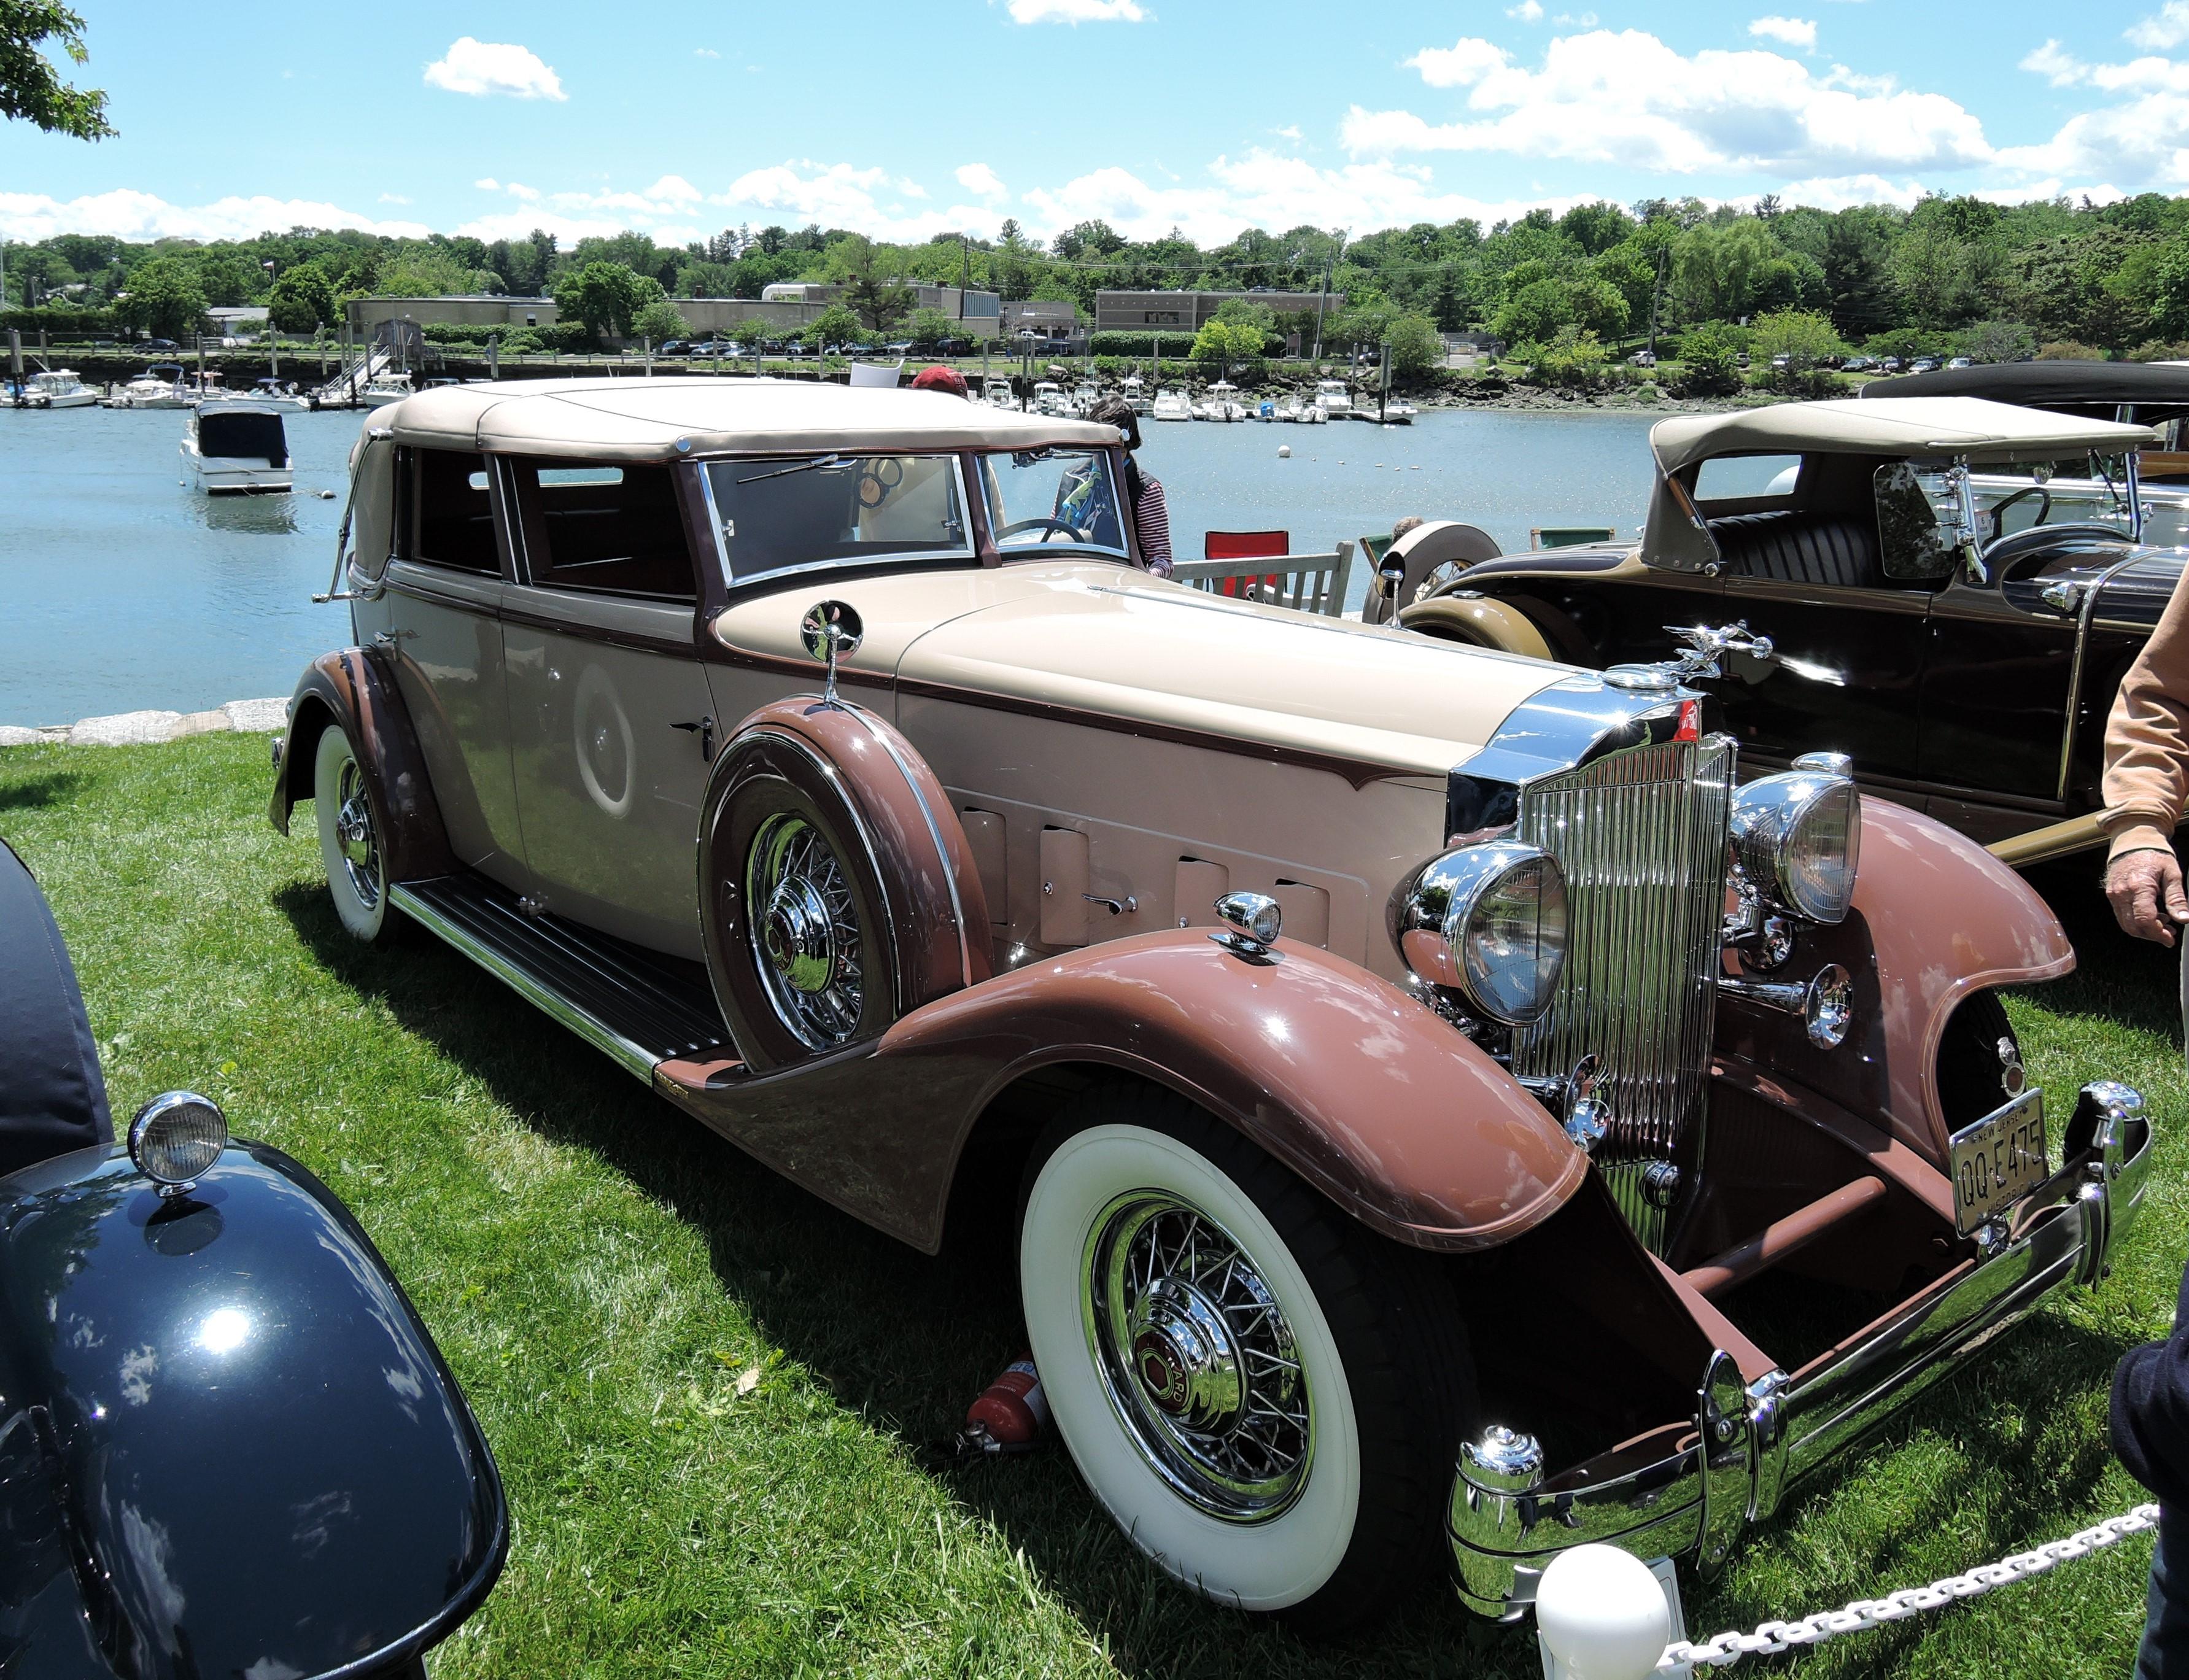 cream/brown 1933 Packard 1006 V-12 Cabriolet Deville - Greenwich Concours d'Elegance 2017